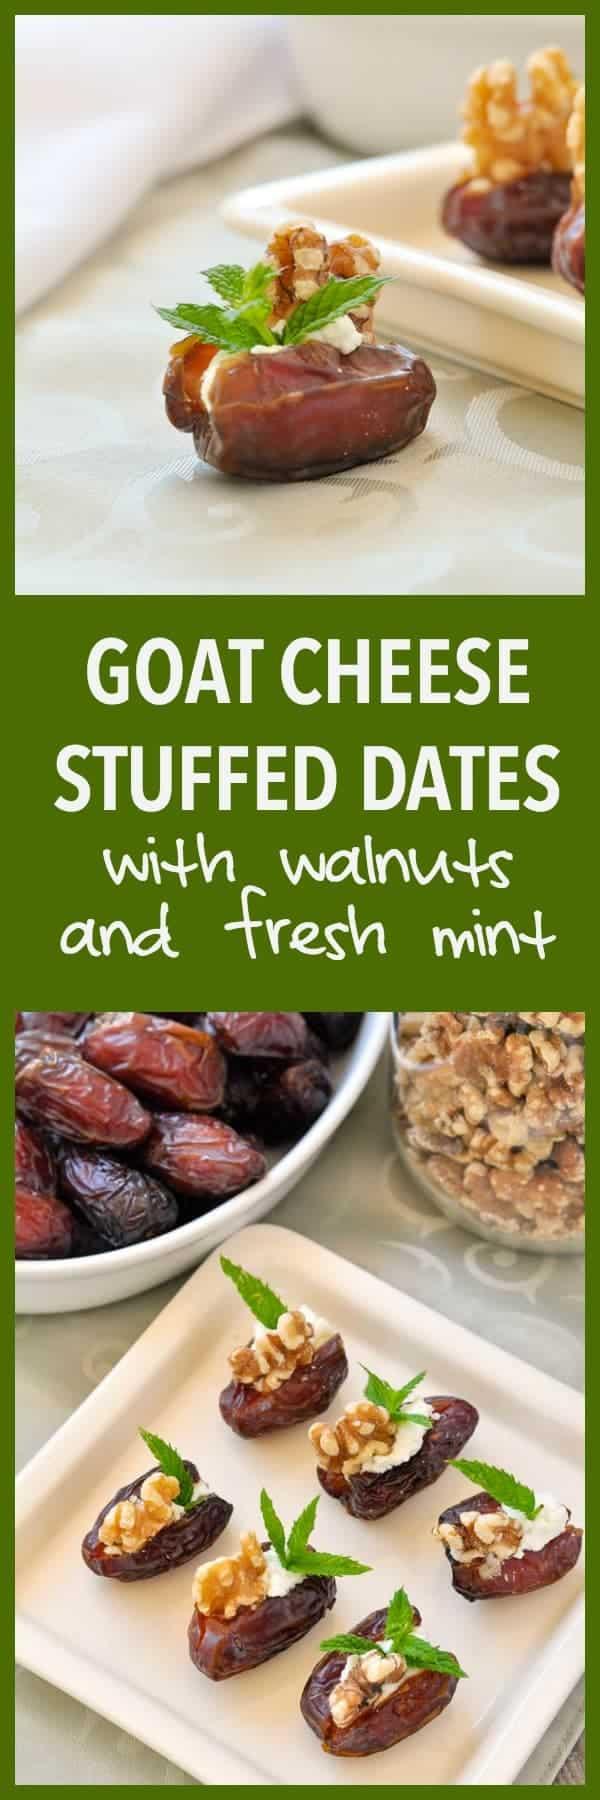 Simply Romanesco: Goat Cheese Stuffed Dates